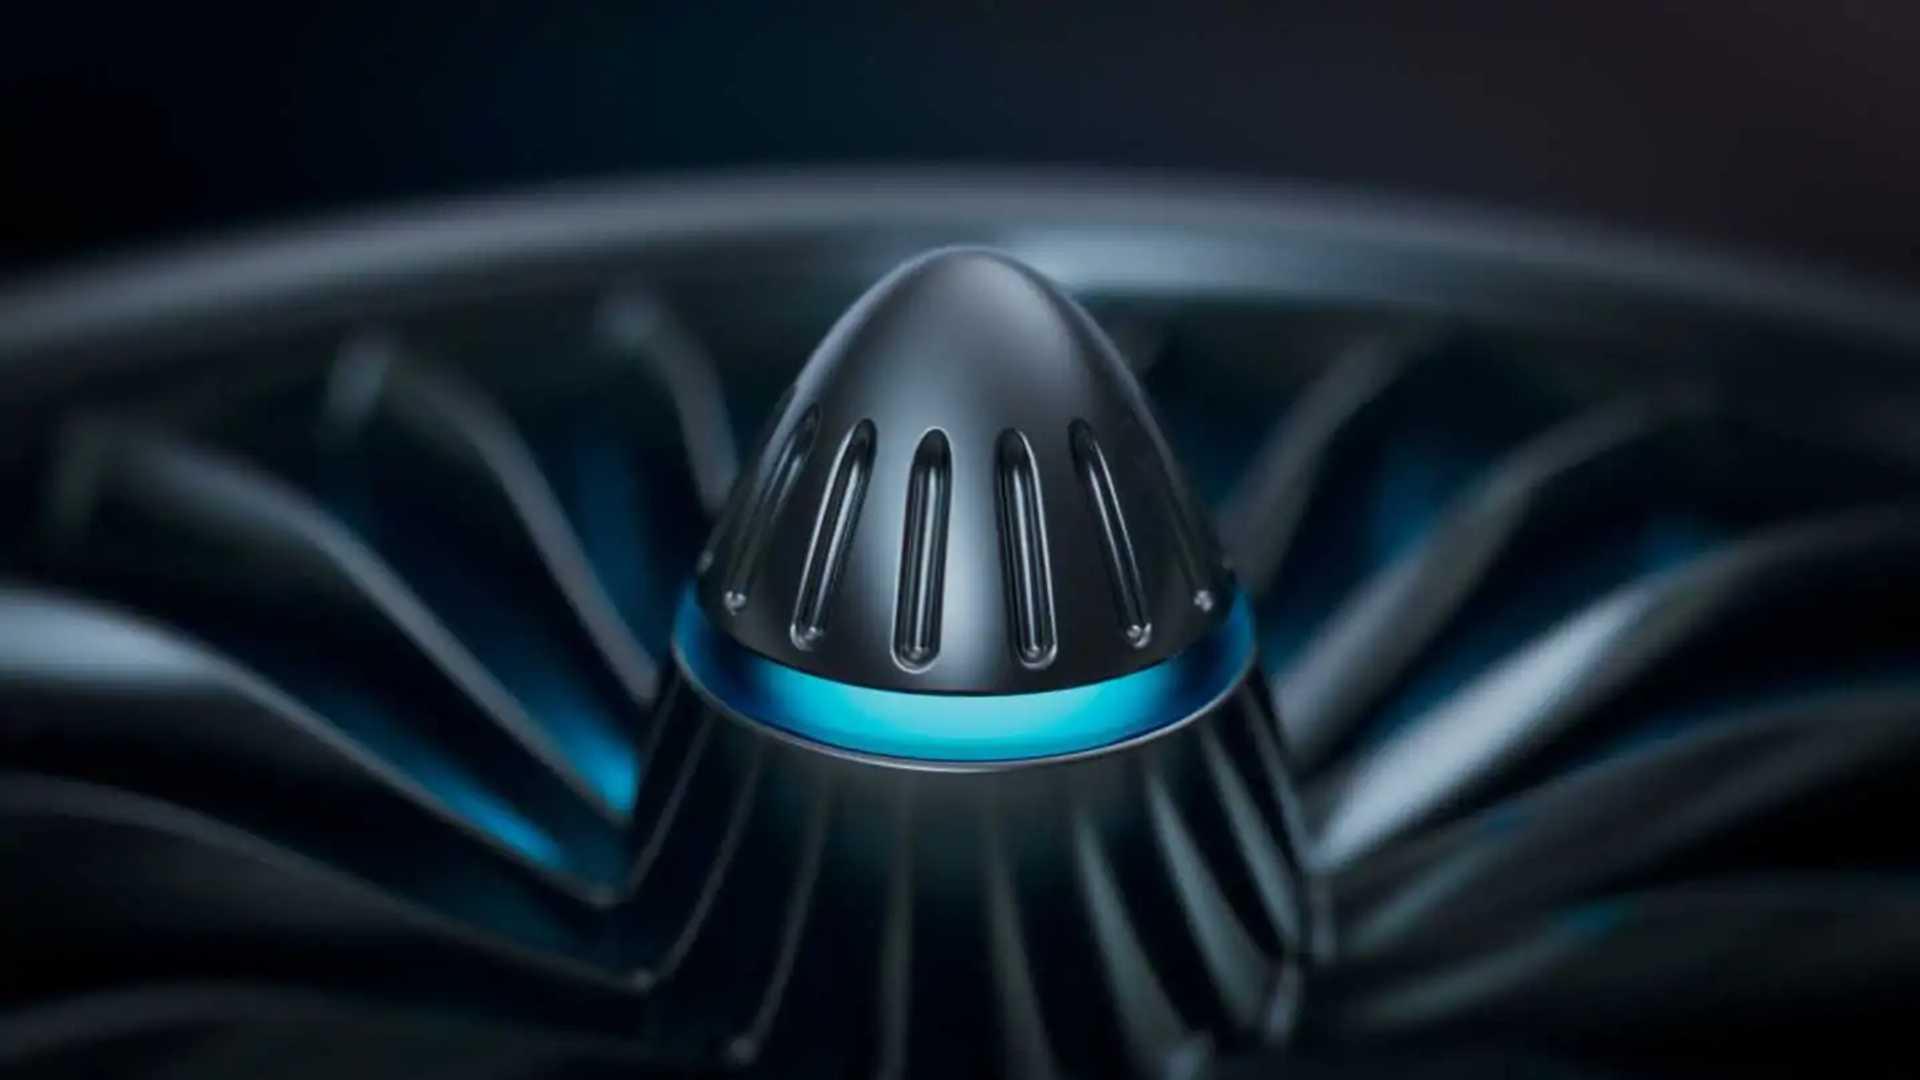 Mercedes-Benz MBUX Hyperscreen Air Vents